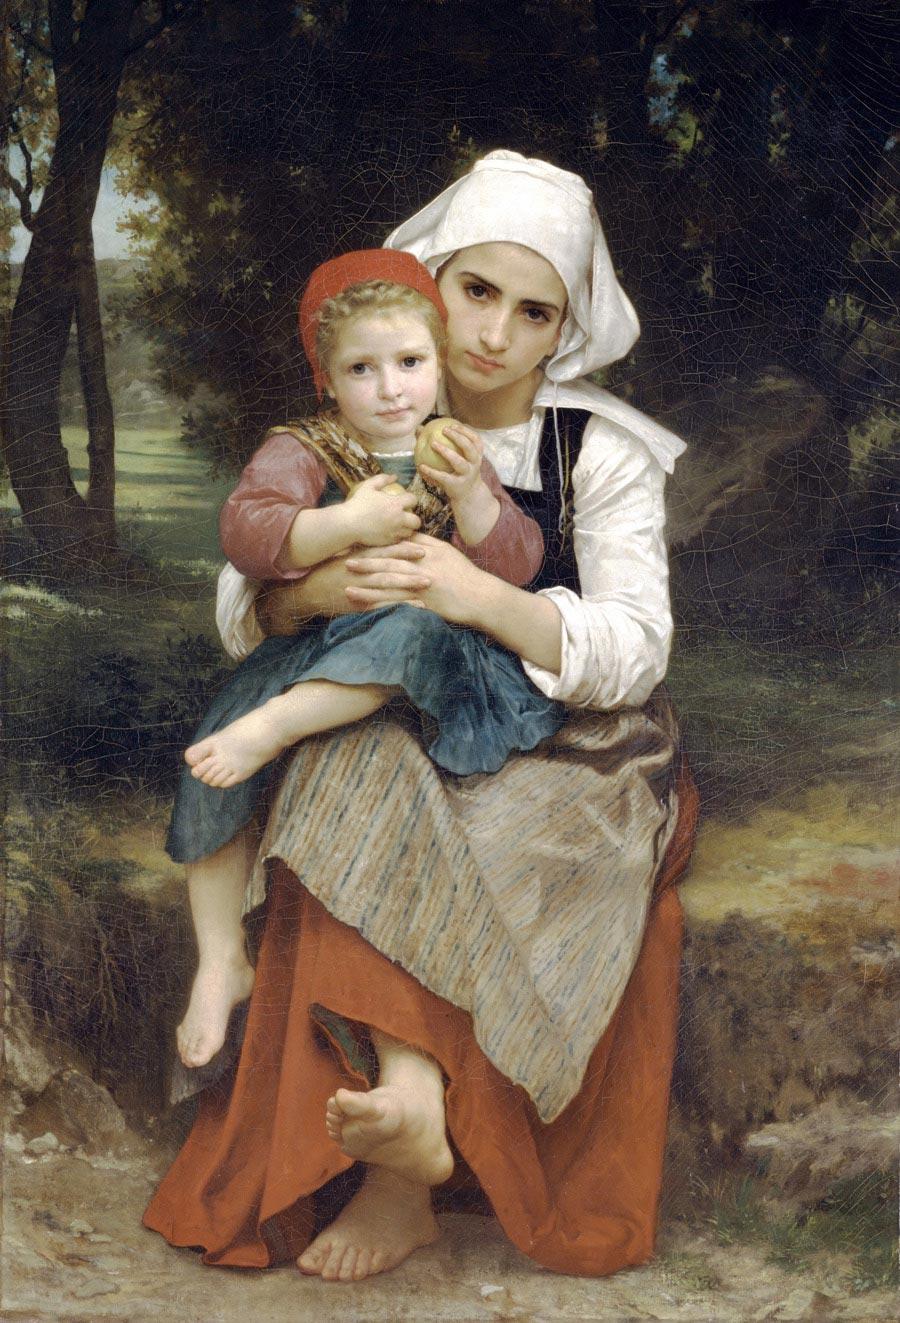 frere-et-soeur-bretons